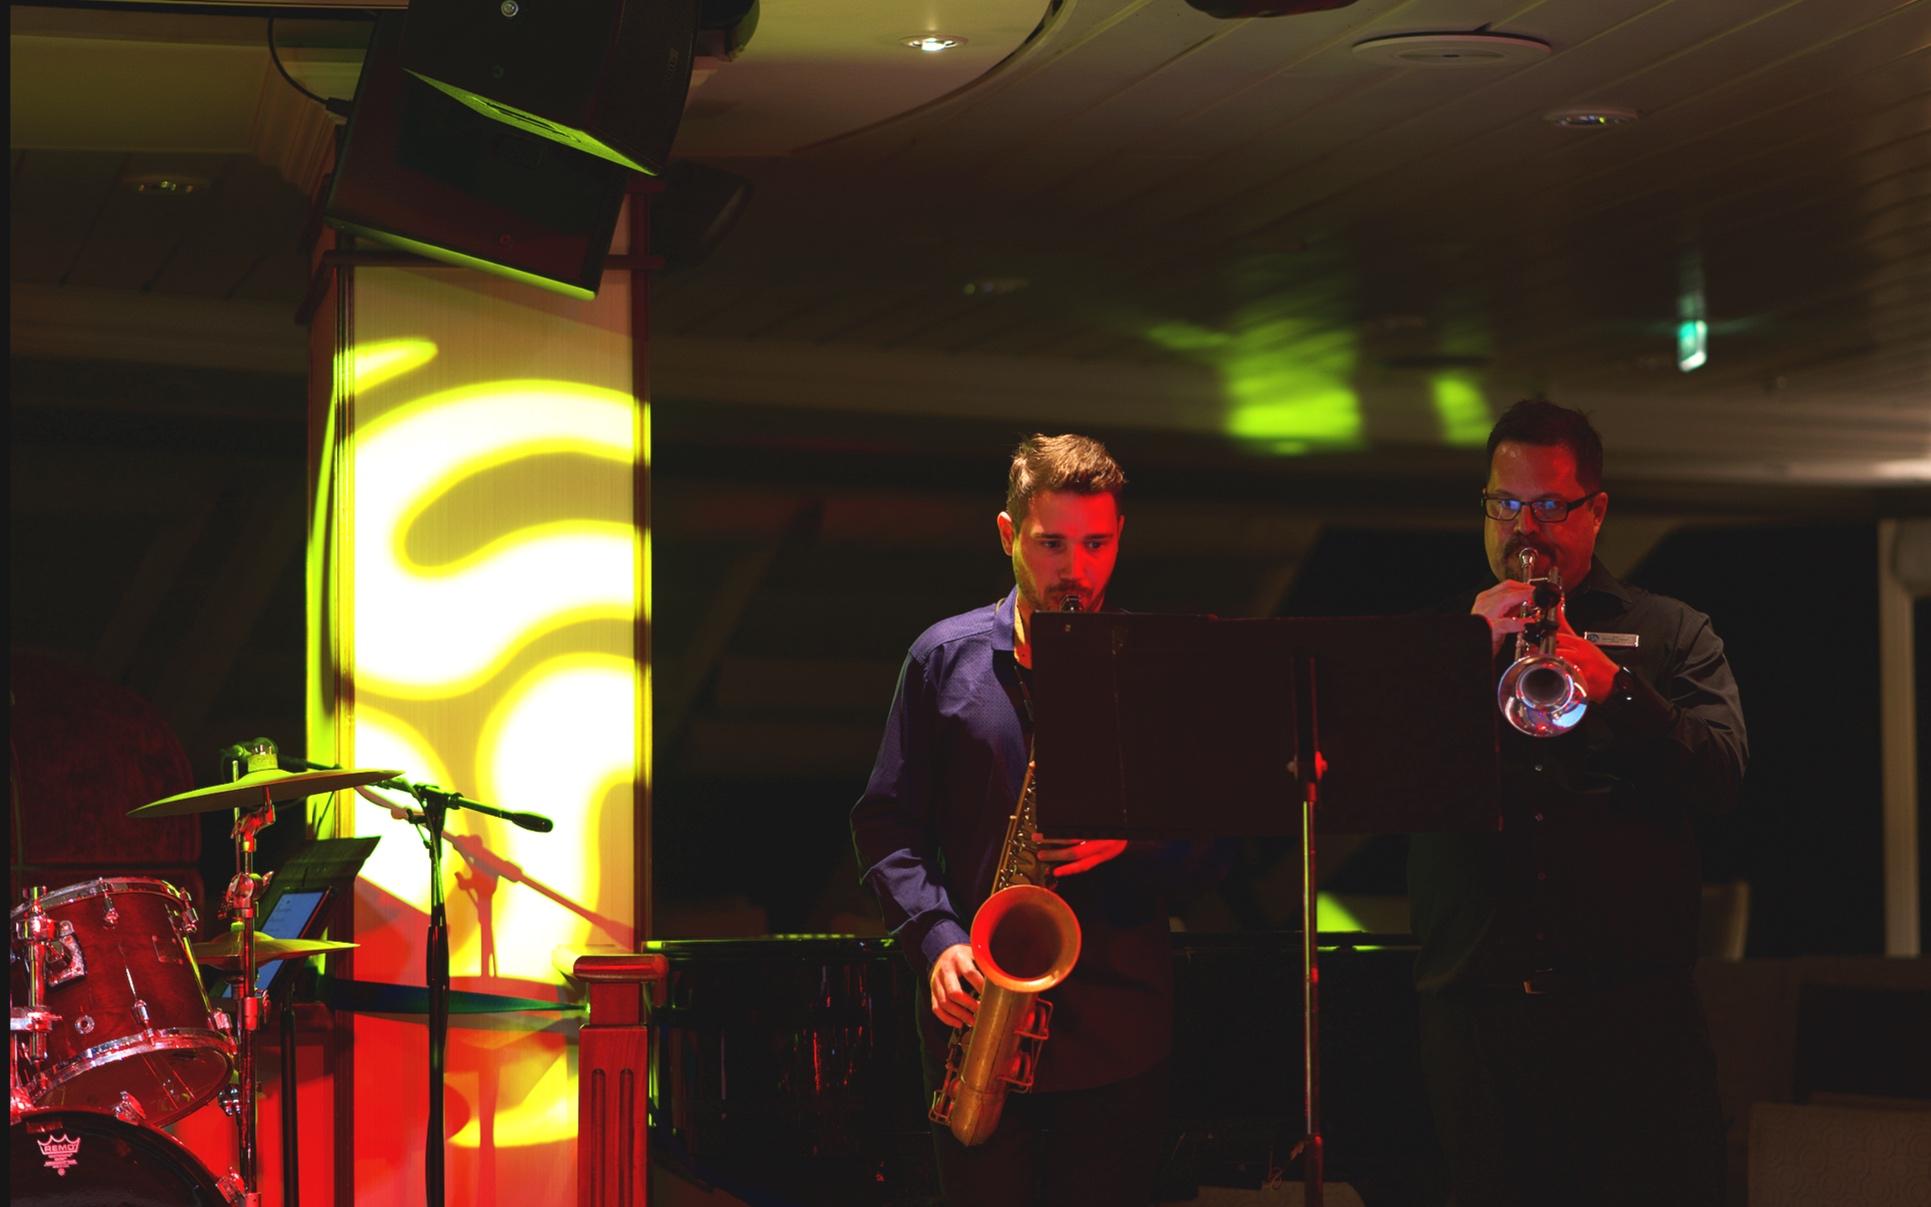 Jazz and funk night.